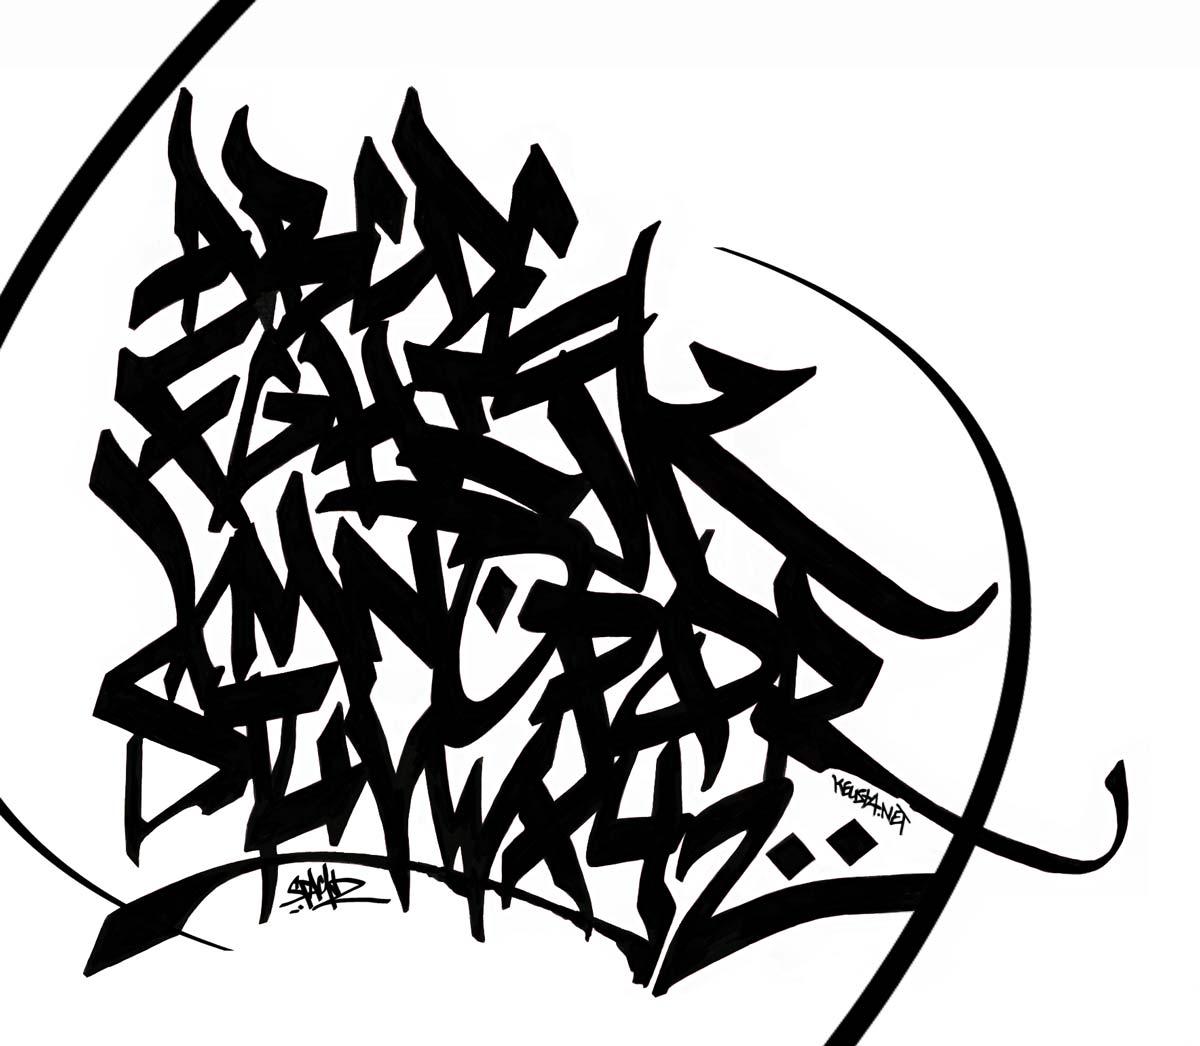 AFRO==============: Graffiti Alphabet A-Z